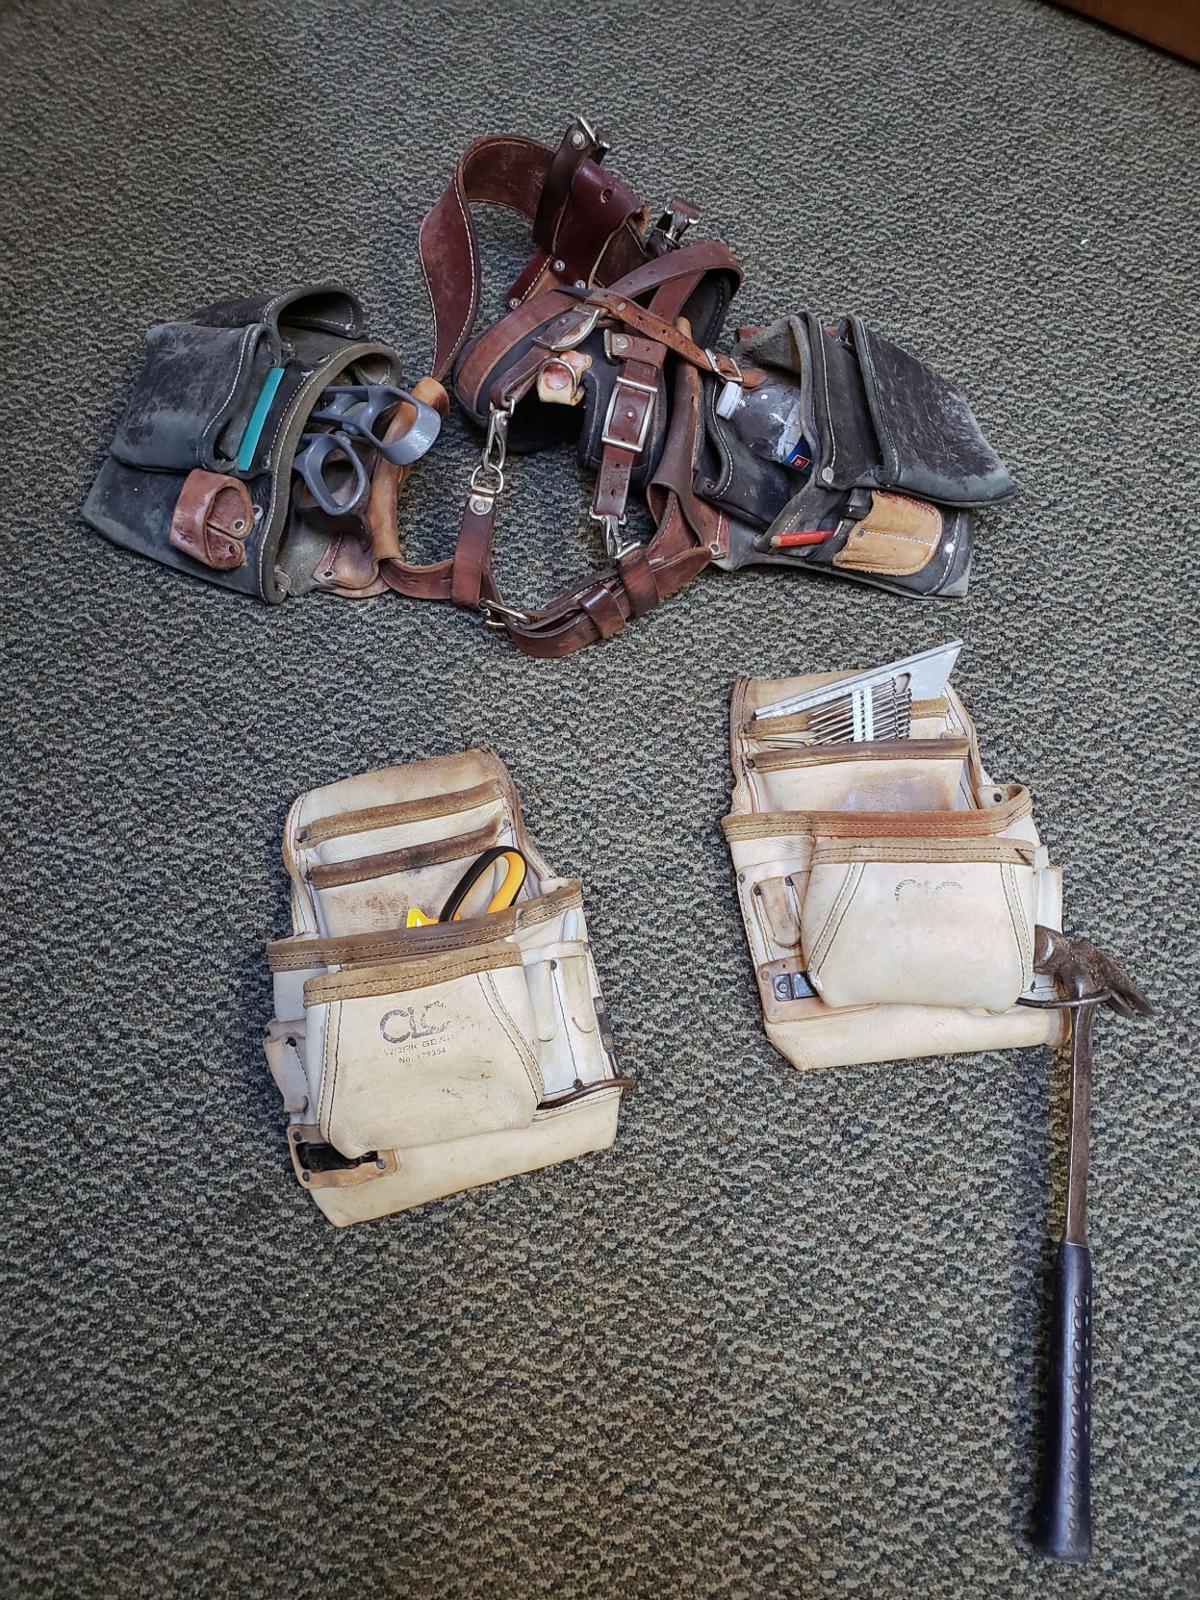 LaFayette crime scene theft items